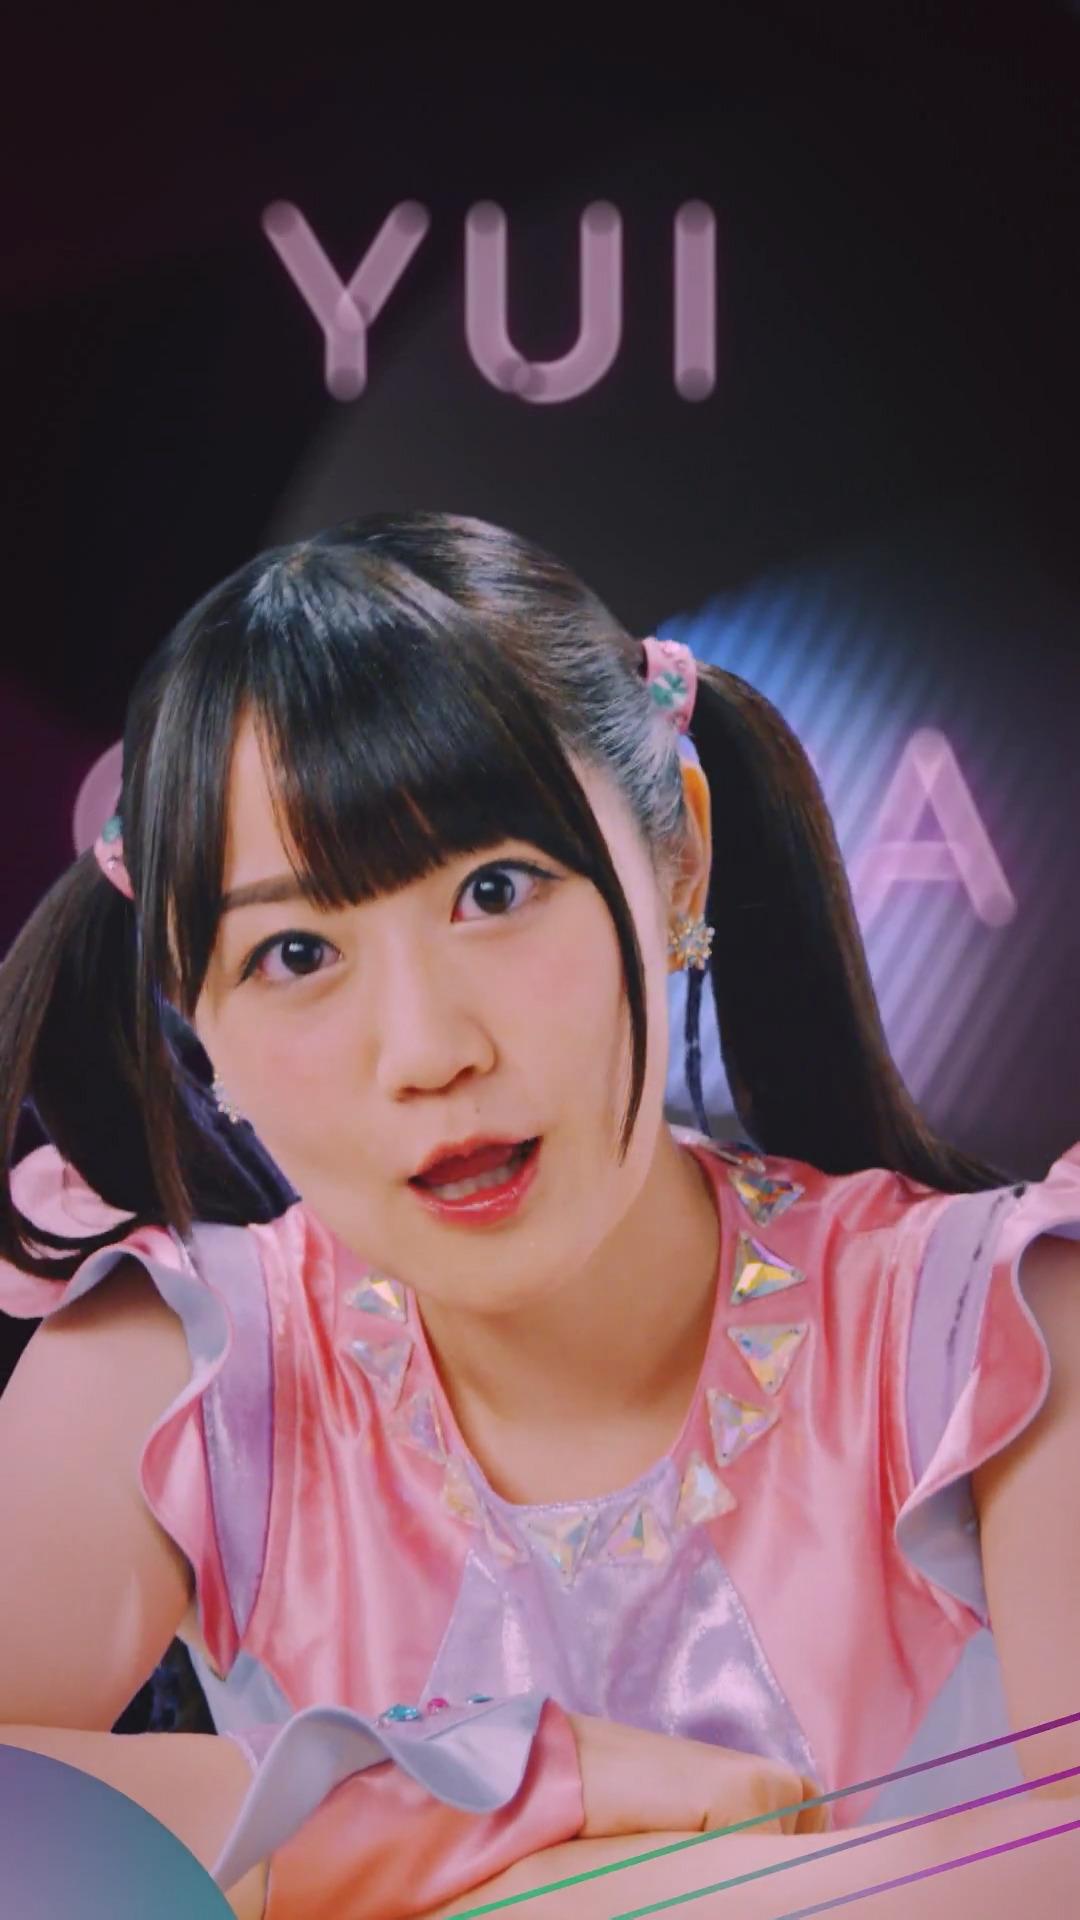 ogura_yui174.jpg